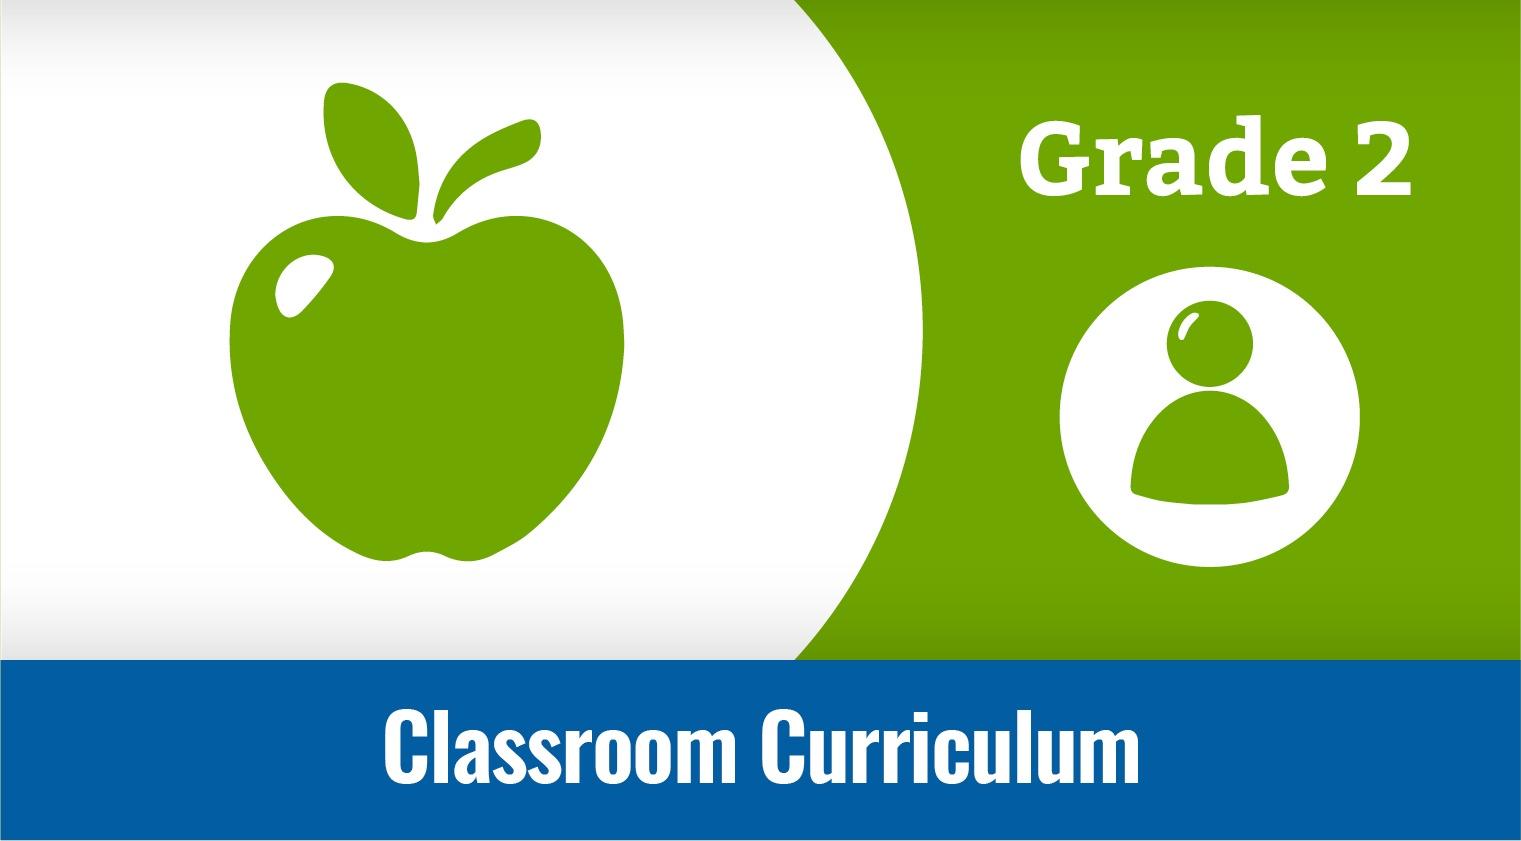 Grade 2 Classroom Curriculum - Celebrate Health!